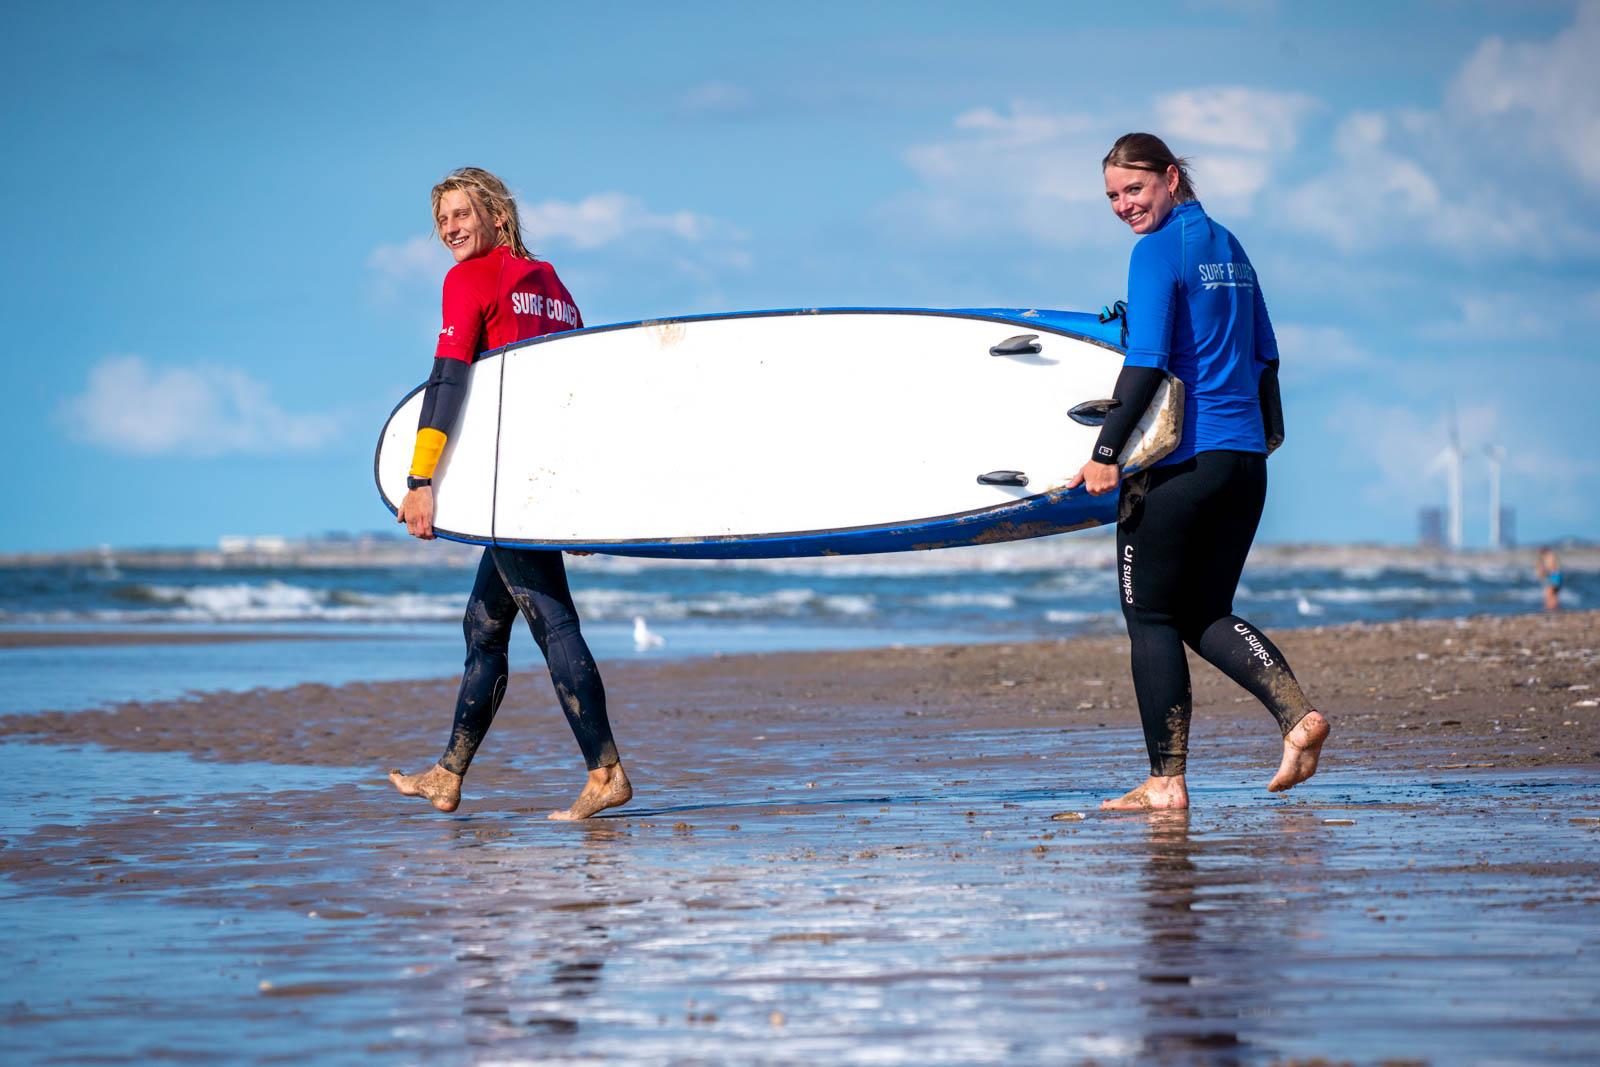 surf clinic bedrijfsuitje strand